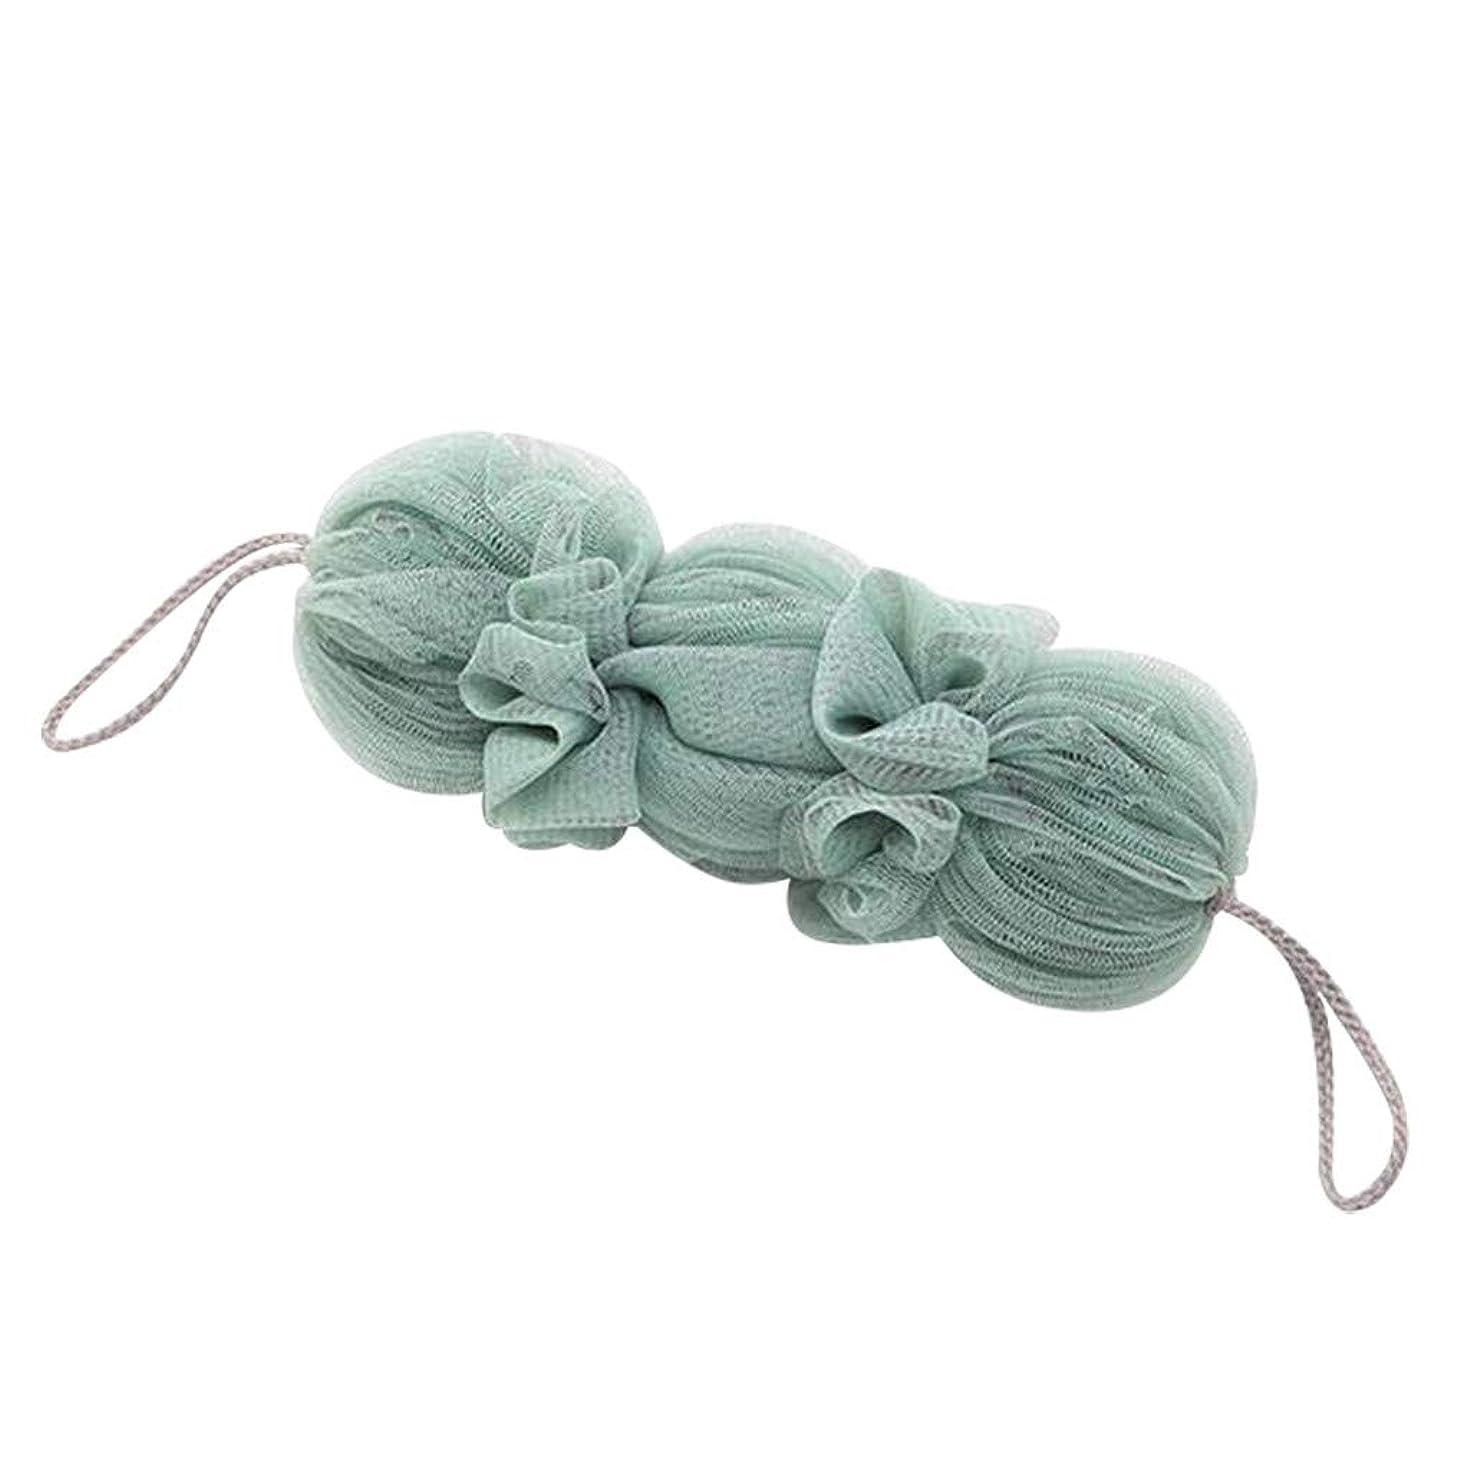 OrchidAmor Long Loofah Bath Shower Sponge Pouf Mesh Ball Exfoliating Premium Scrubber 2019 New Fashion